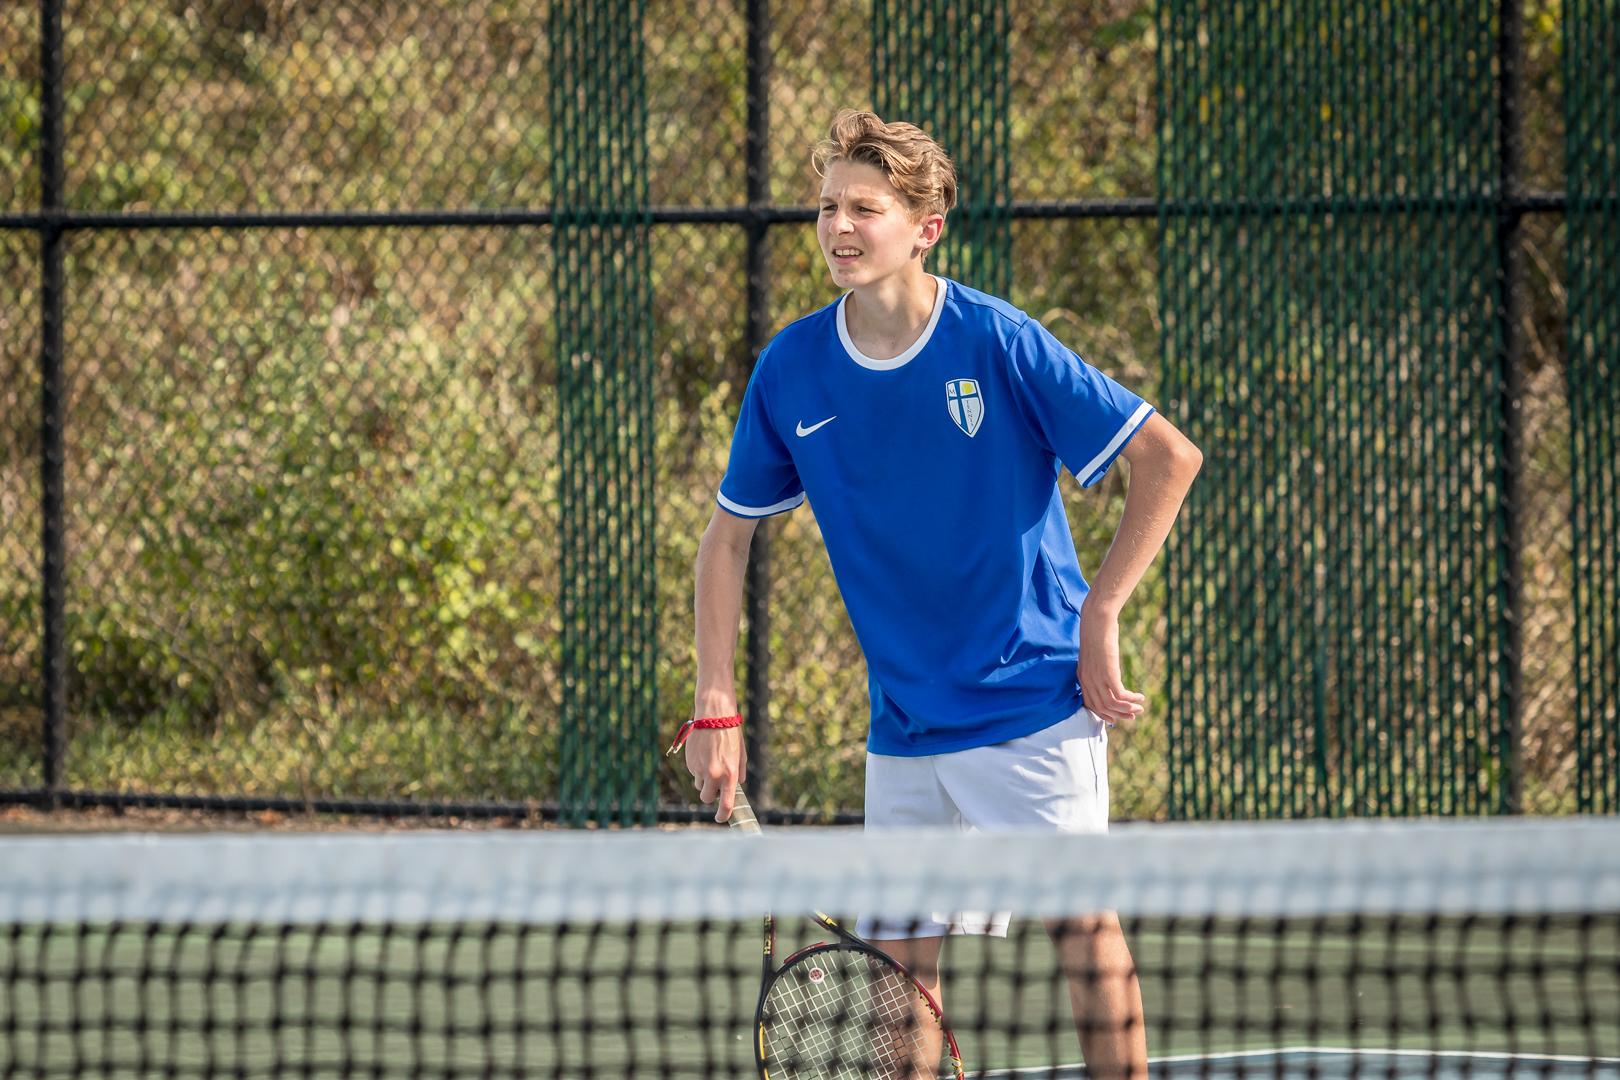 Marian-Boys-Tennis-1557.jpg